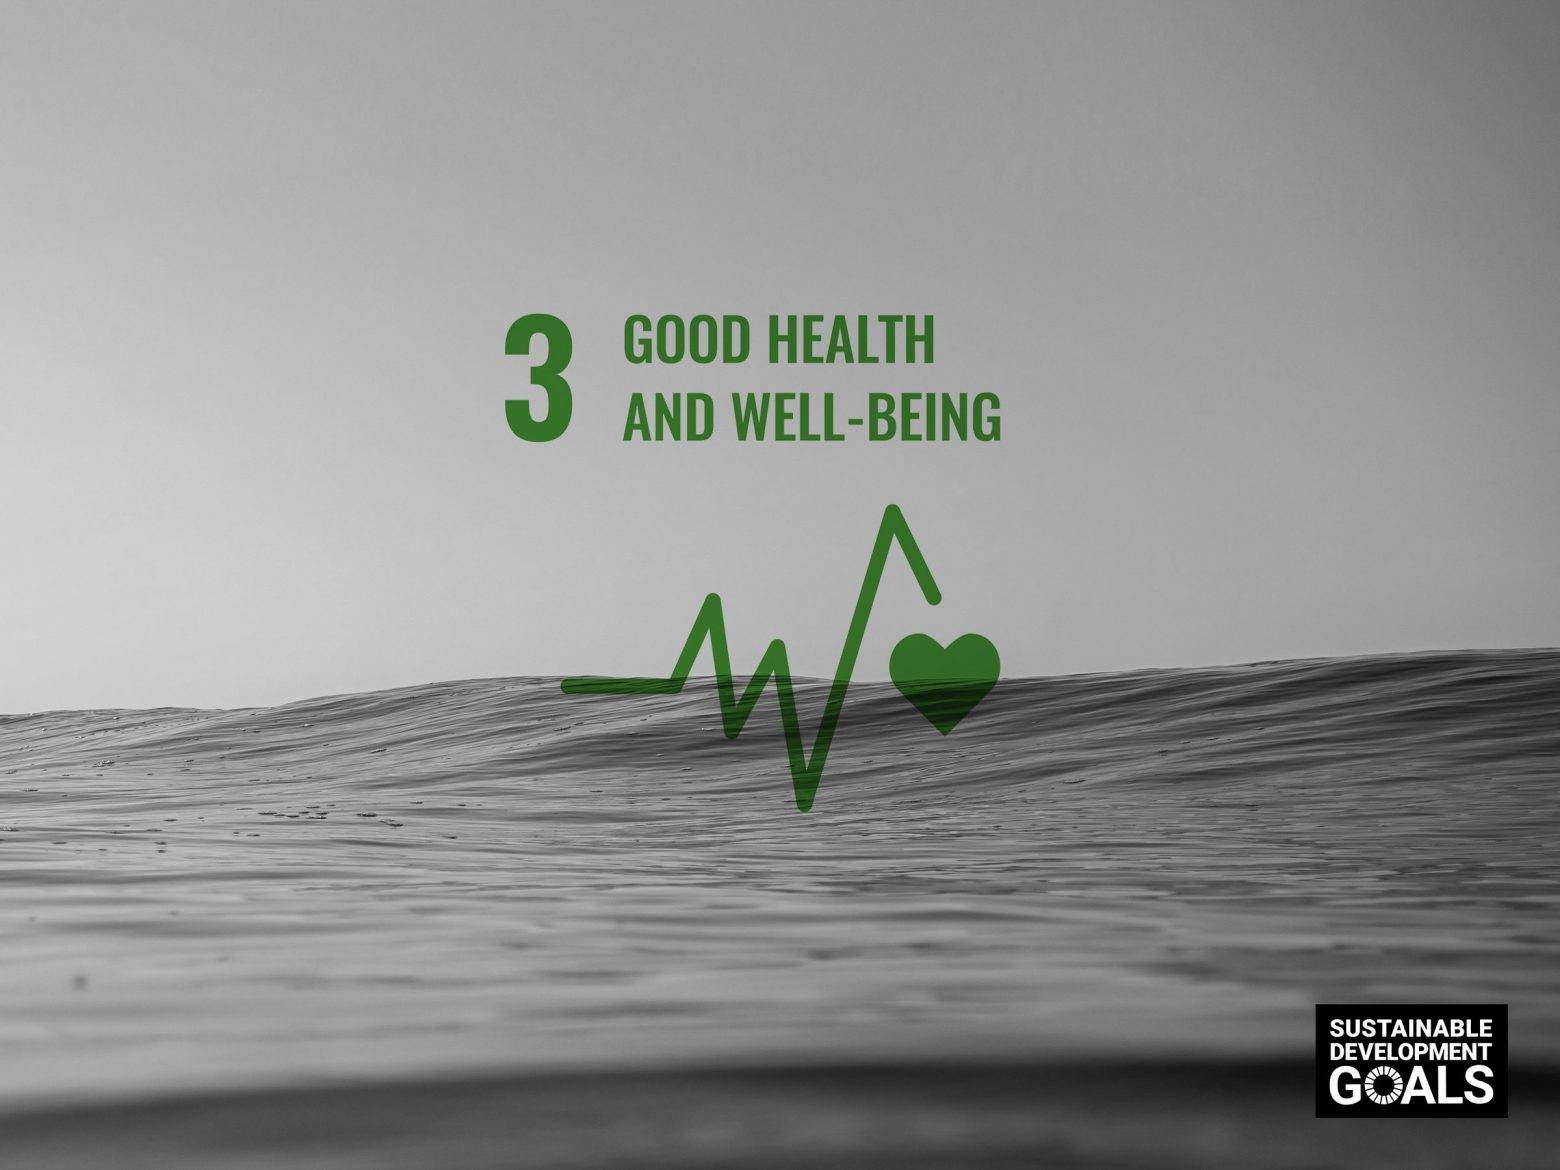 https://www.soulandsurf.com/wp-content/uploads/2021/08/our-sustainable-ish-plan-S_S-UNSDG-Good-Health-e1628601726216.jpg Image